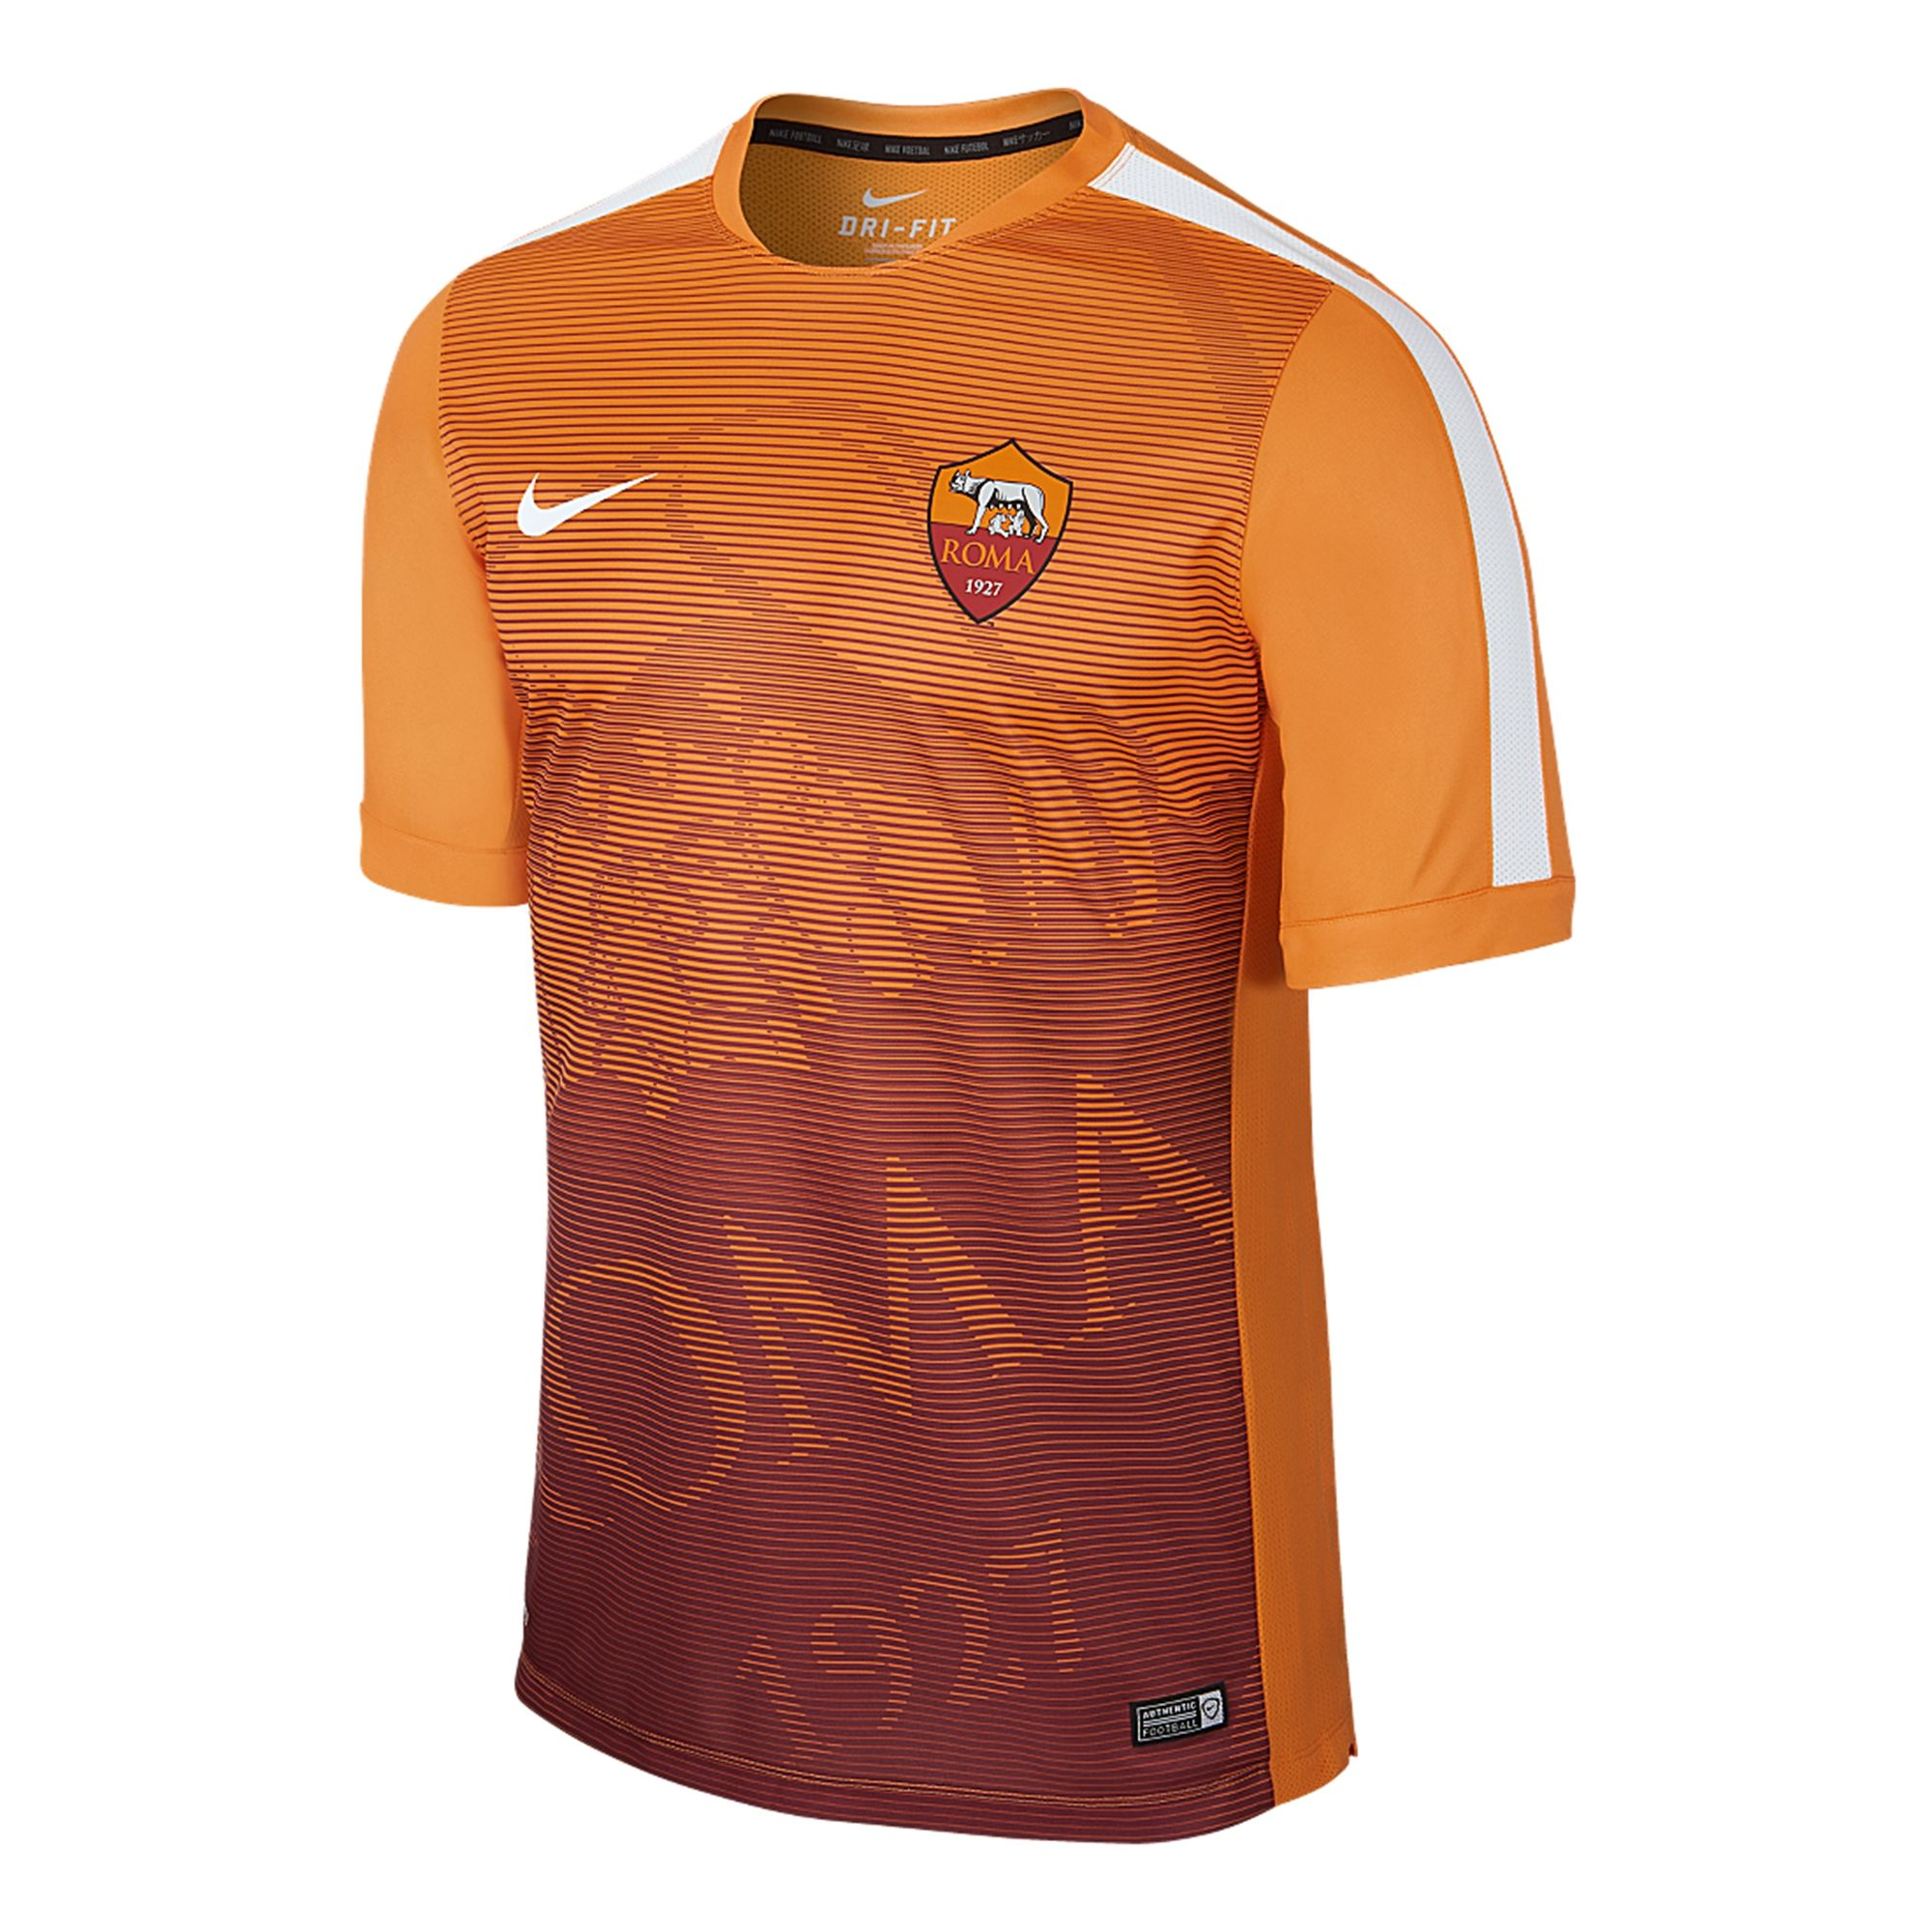 Camiseta Masculina Nike Roma Squad Pré-Jogo - Nike no Nike.com.br 84af926eef12b